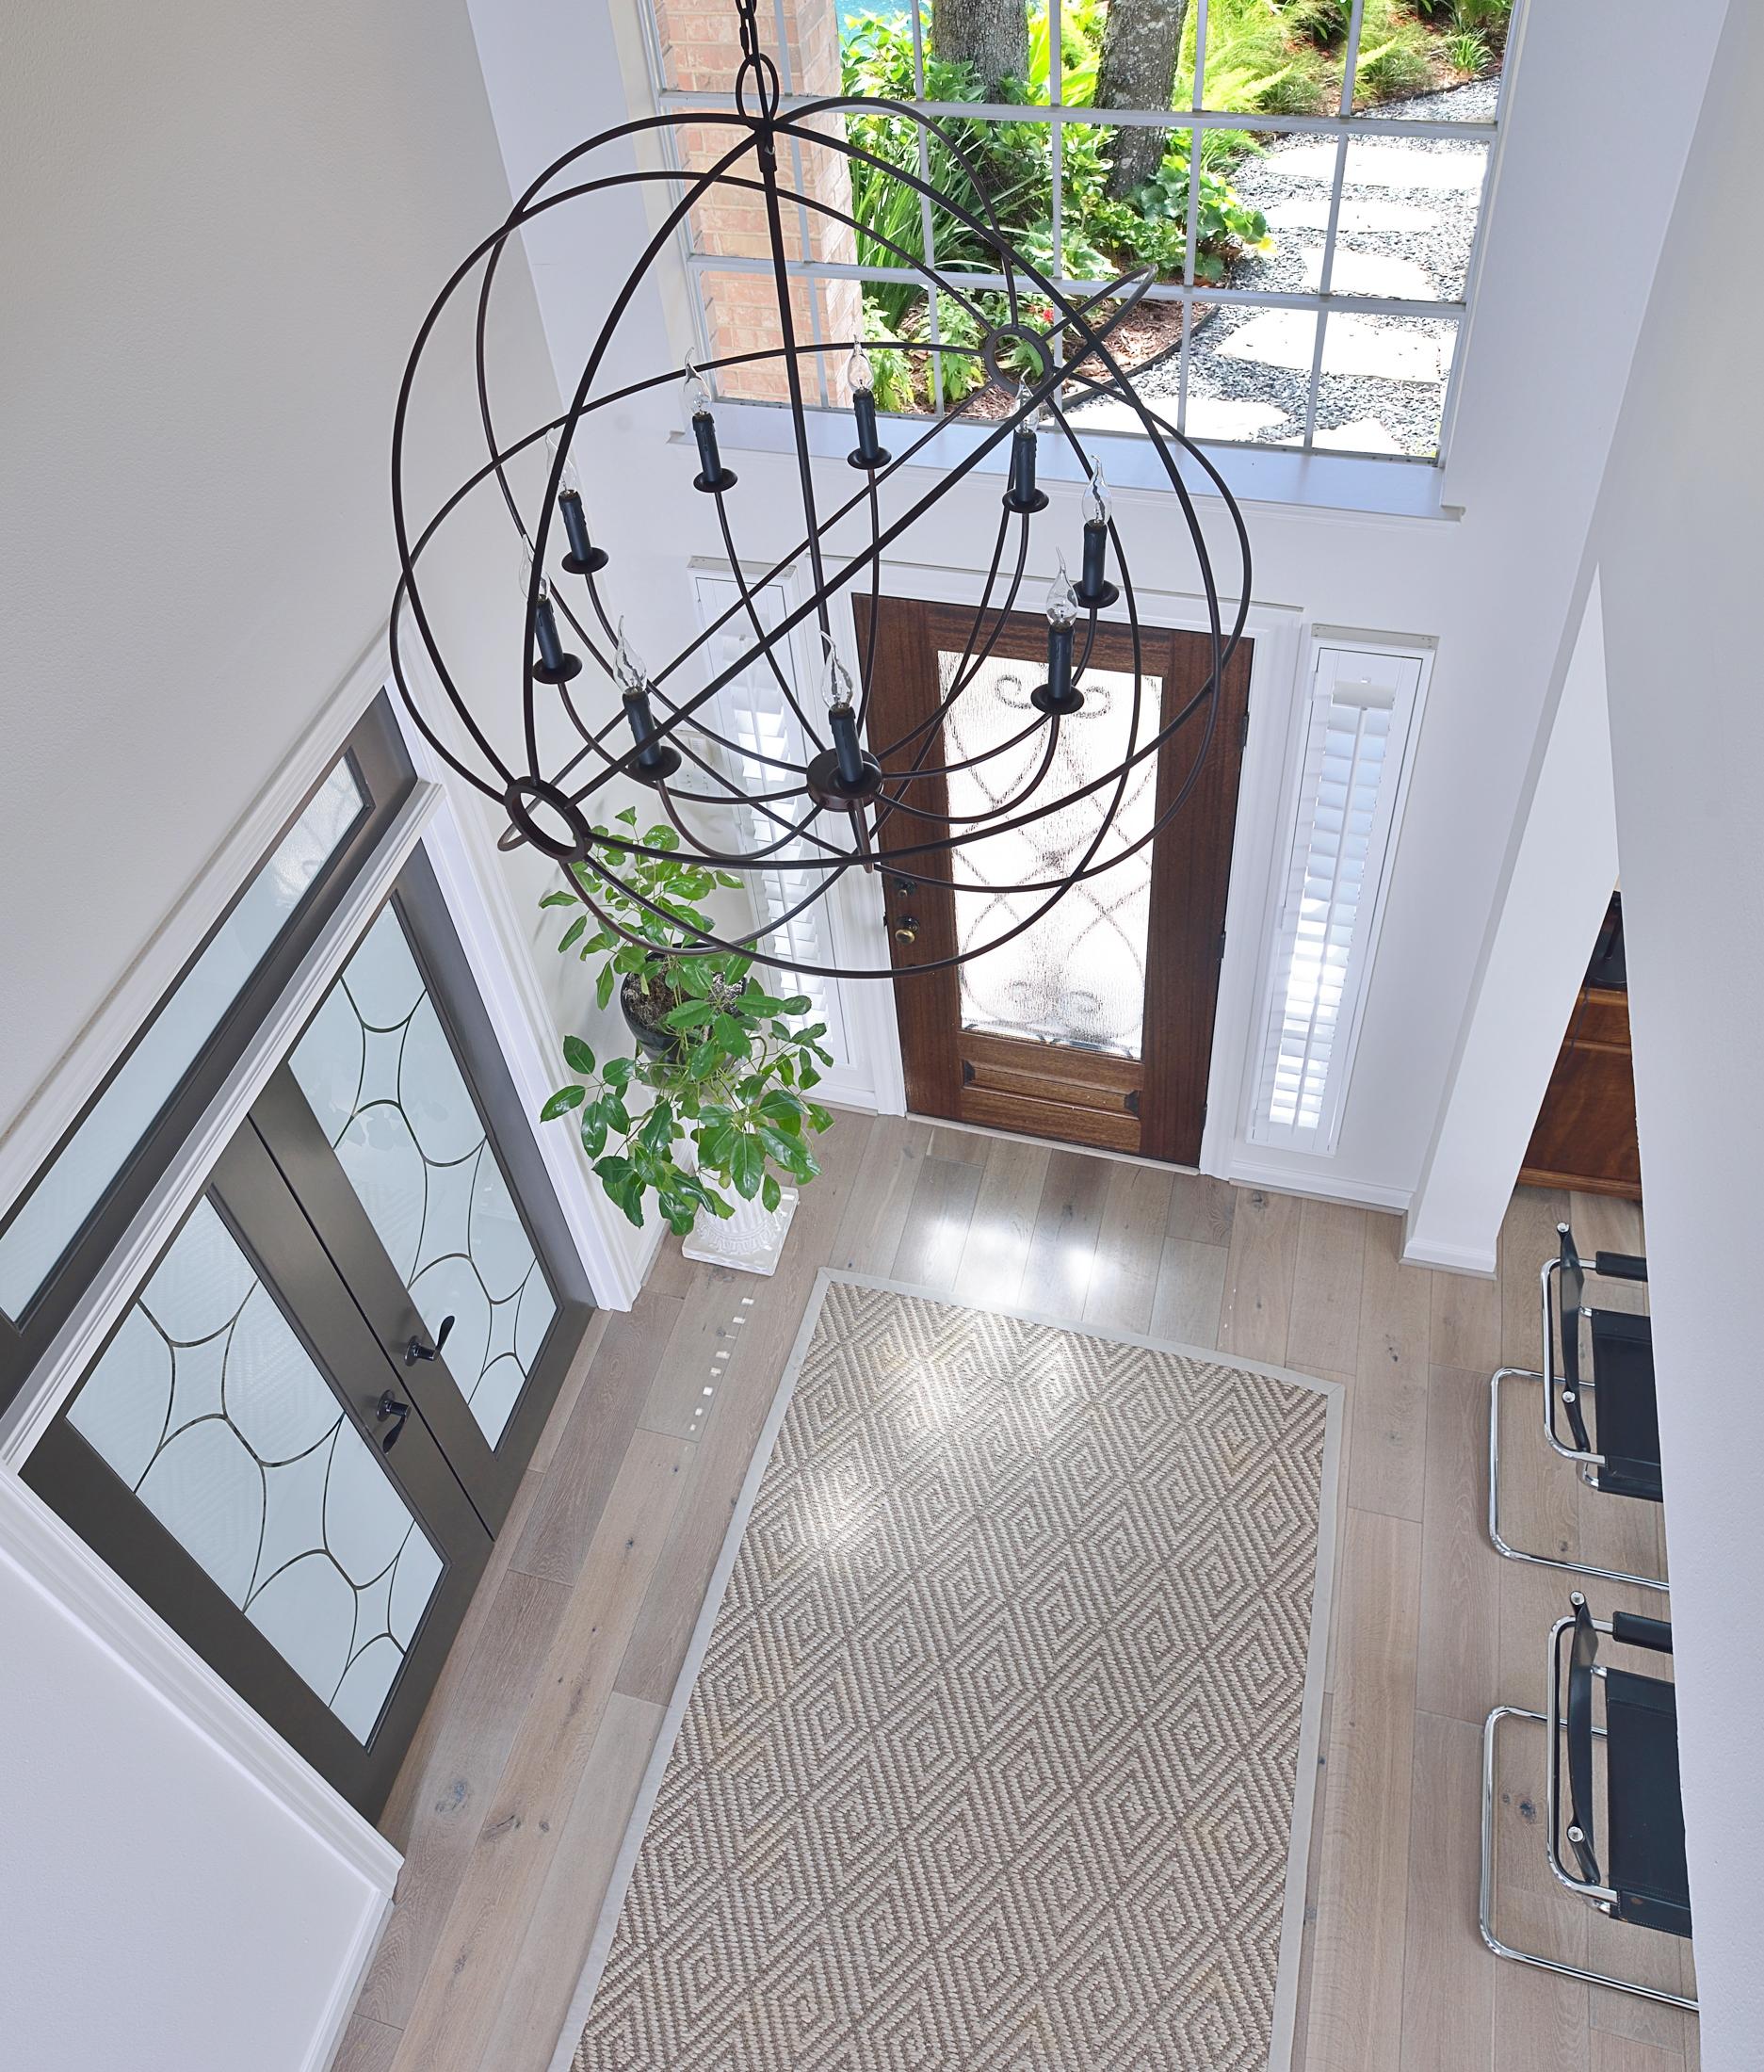 Entry hall foyer with seagrass, natural fiber rug | Carla Aston, Designer | Photographer: Miro Dvorscak #seagrassrug #entryhall #foyer #naturalfiberrug